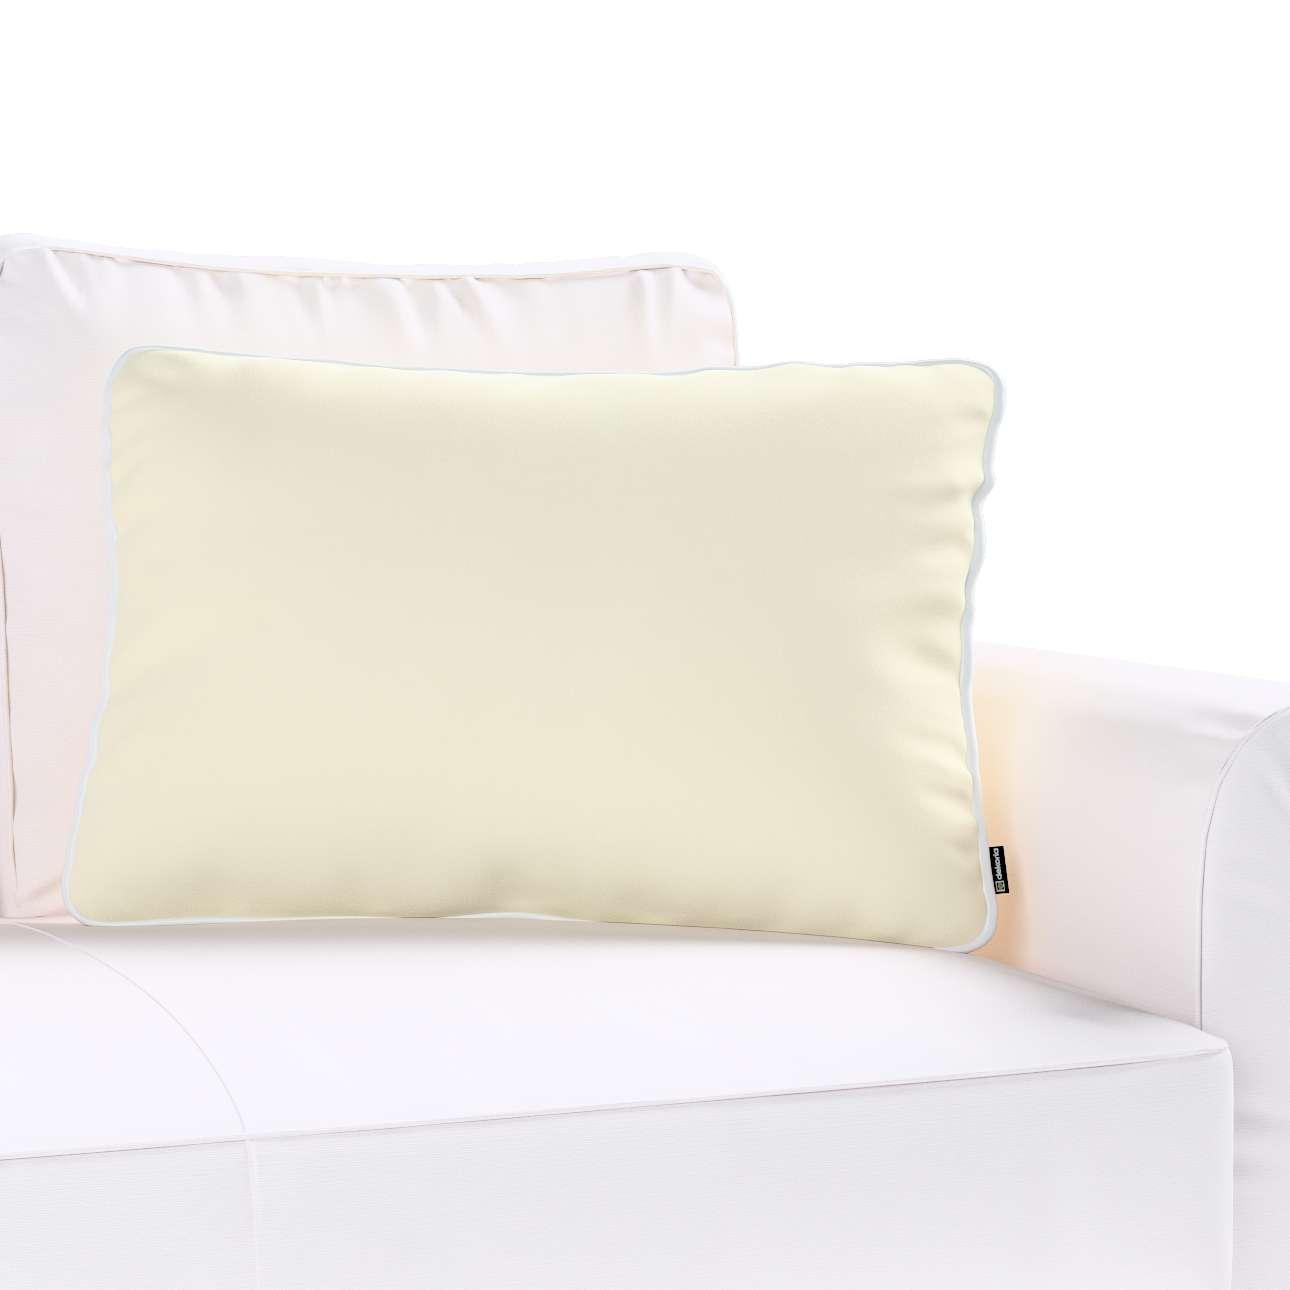 Poszewka Laura na poduszkę prostokątna 60 × 40 cm w kolekcji Velvet, tkanina: 704-10